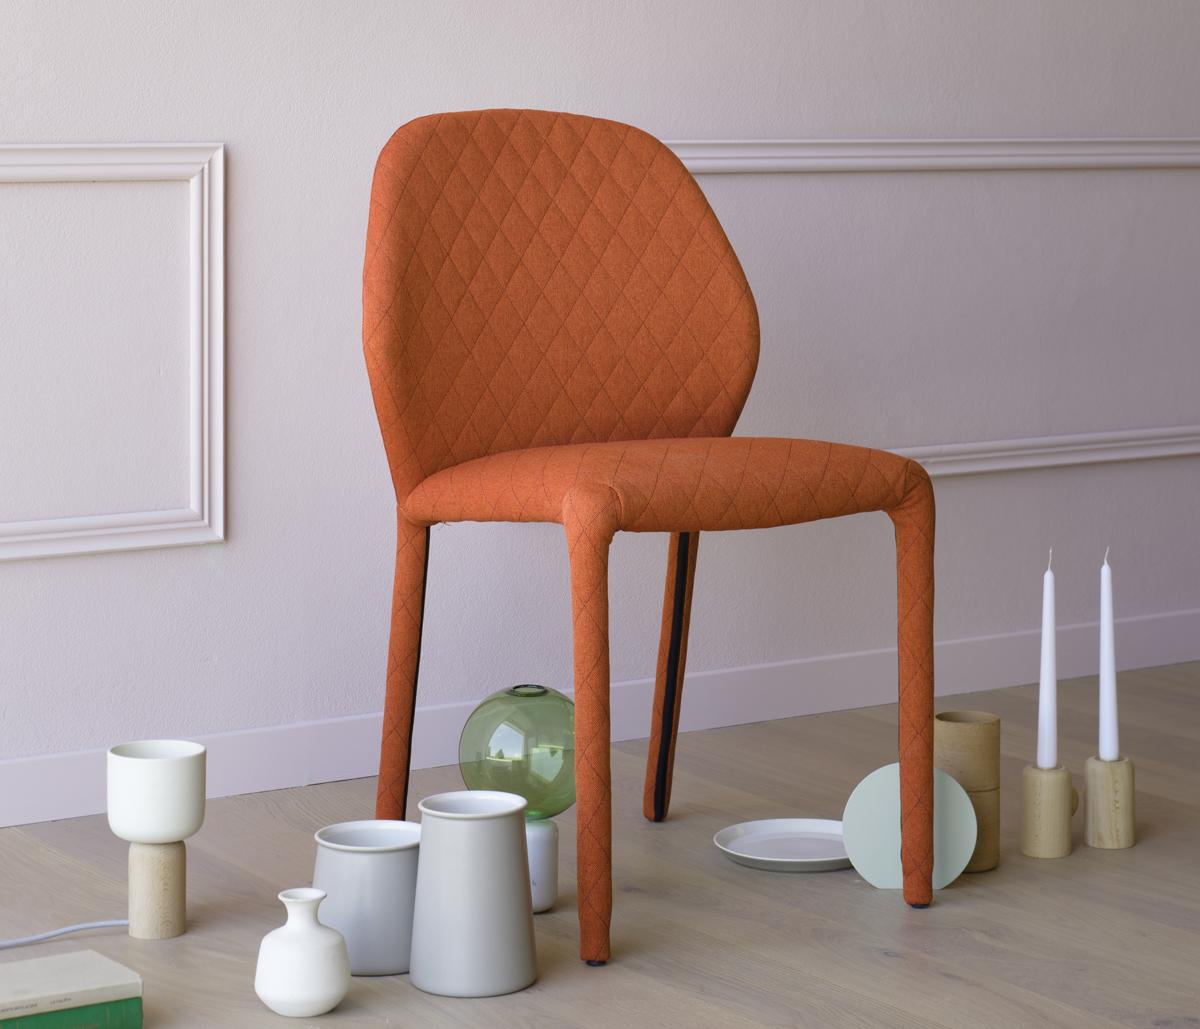 Dumbo Chair